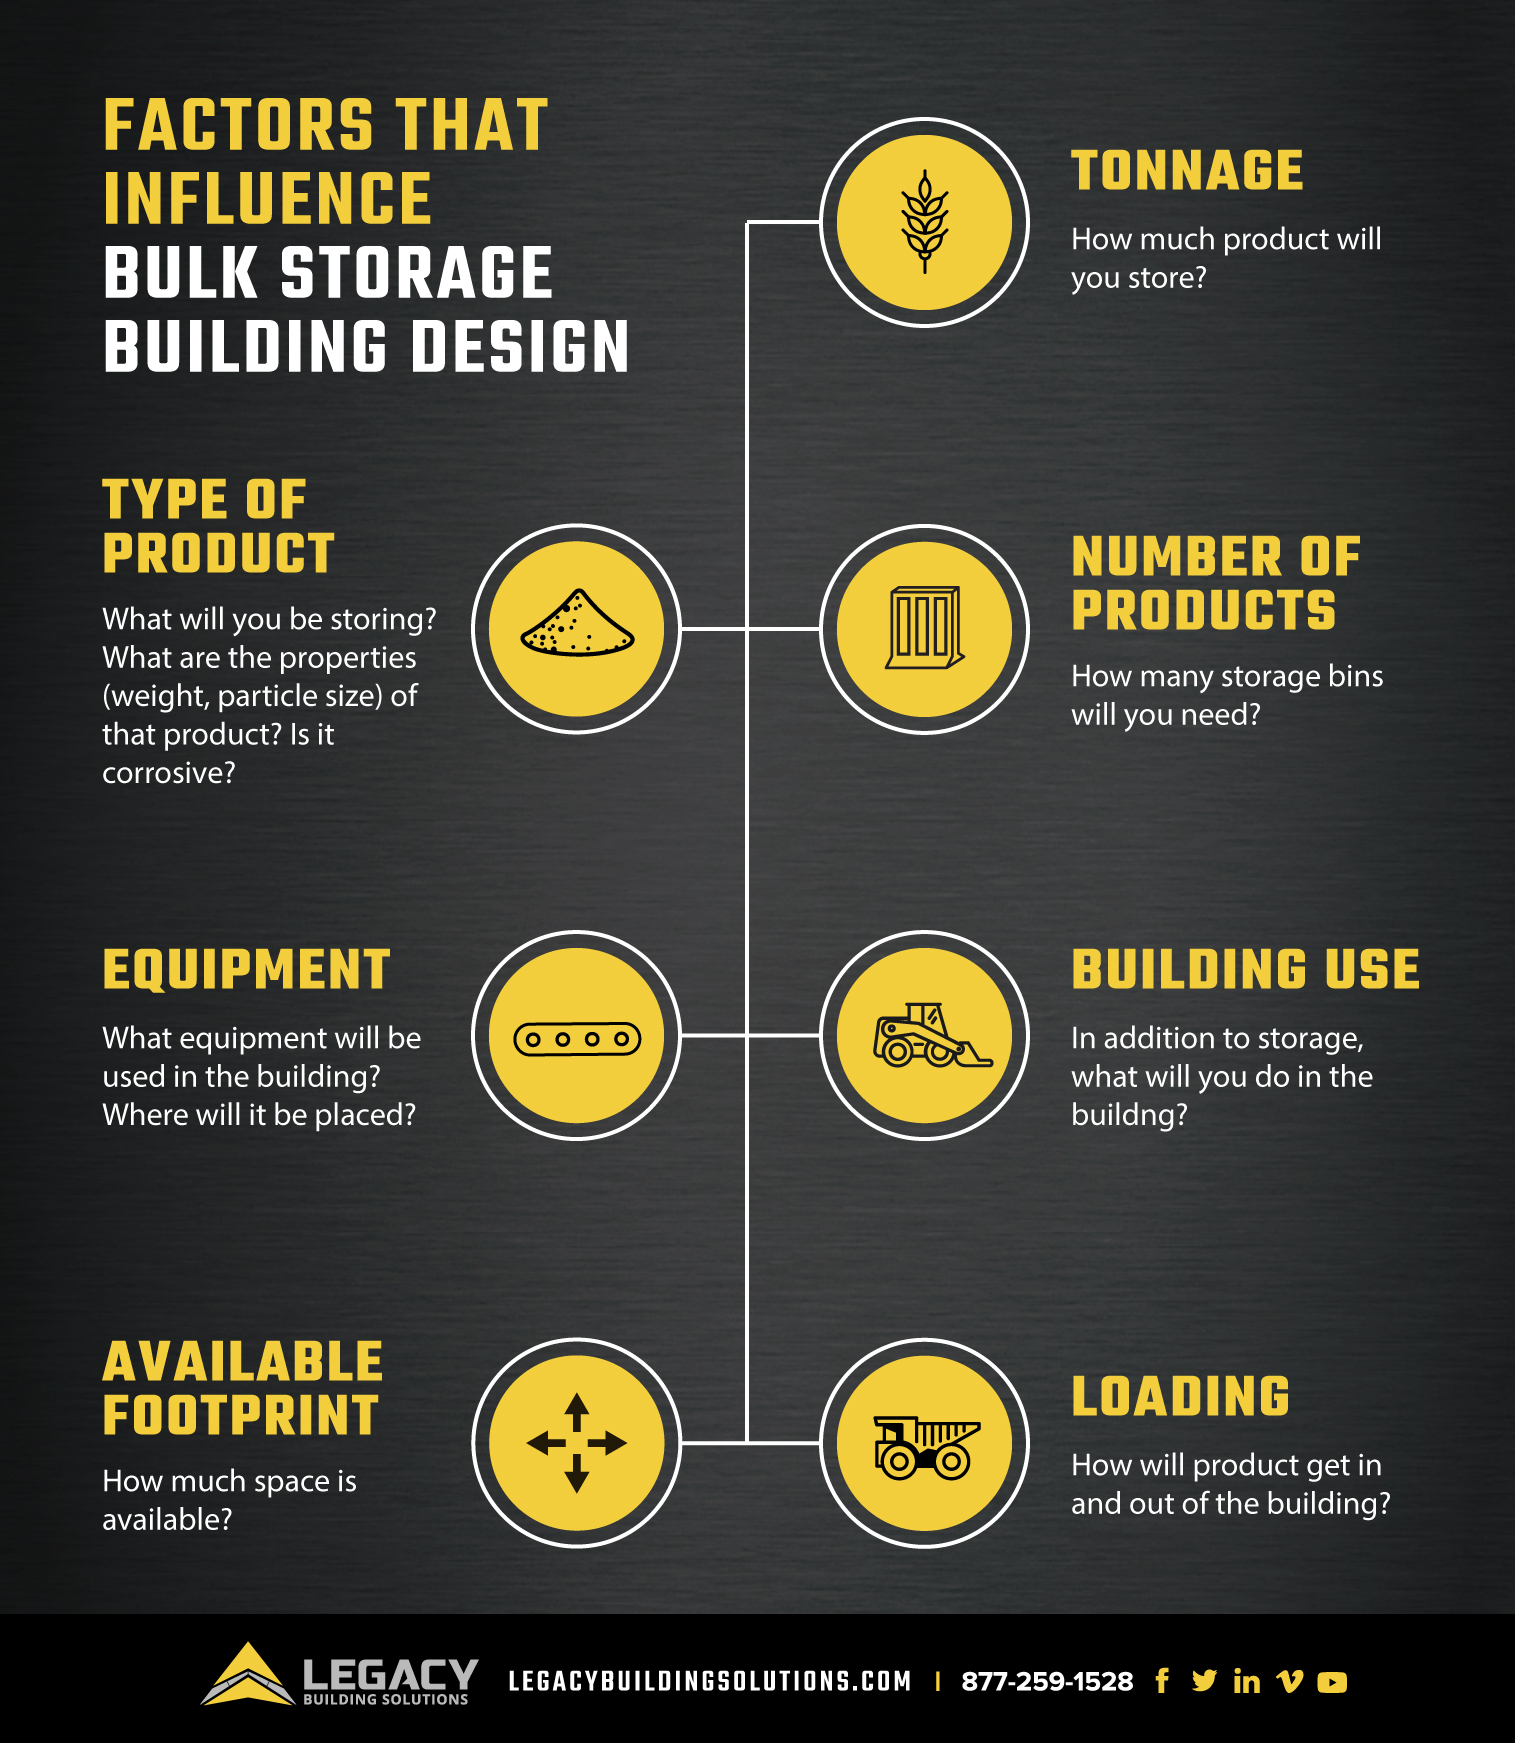 Bulk storage building design